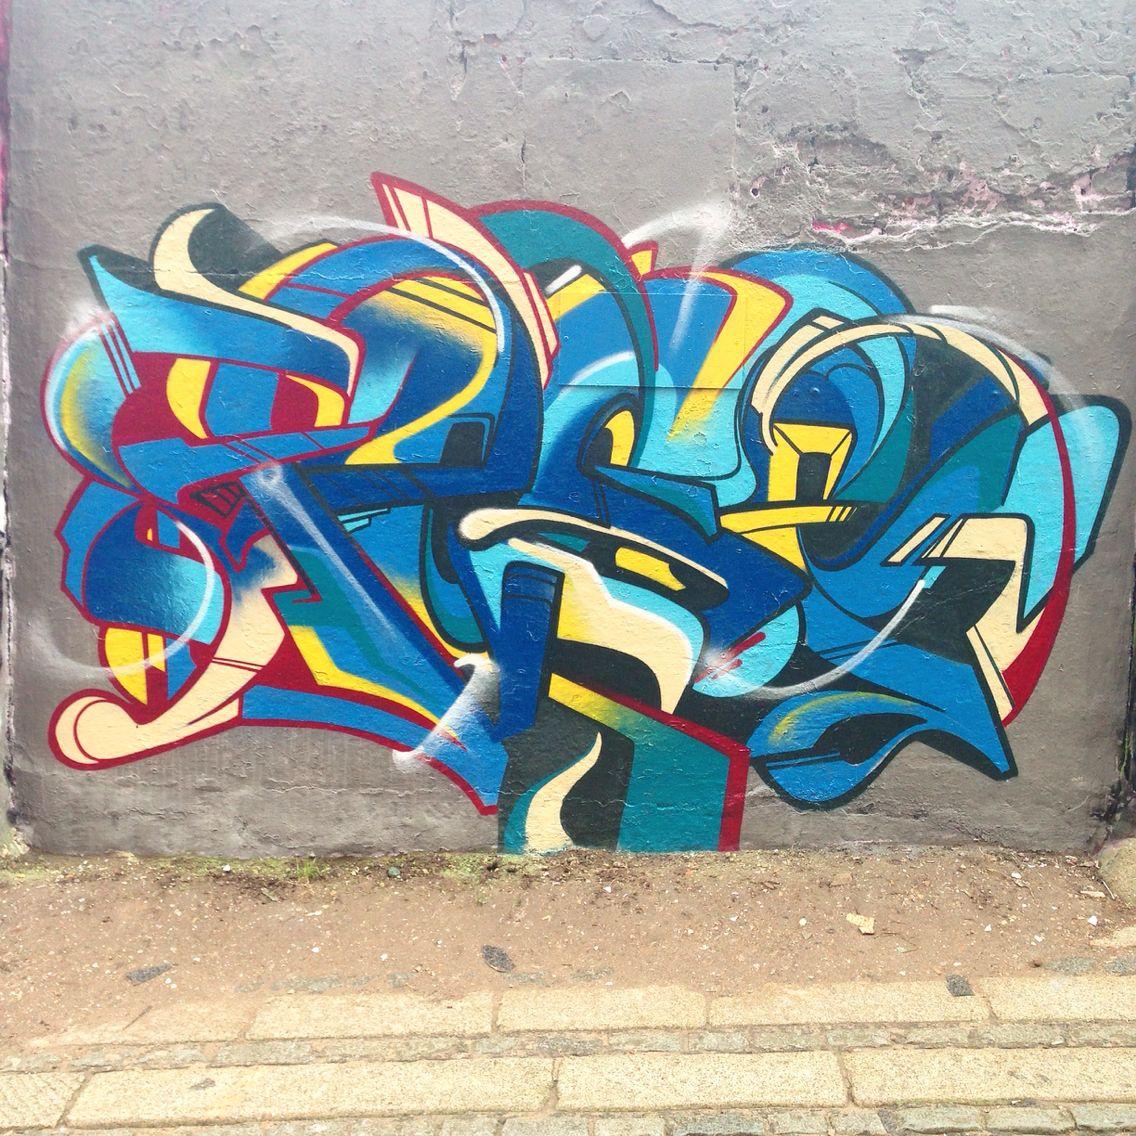 PESE today at the Zap Graffiti studio, Liverpool.